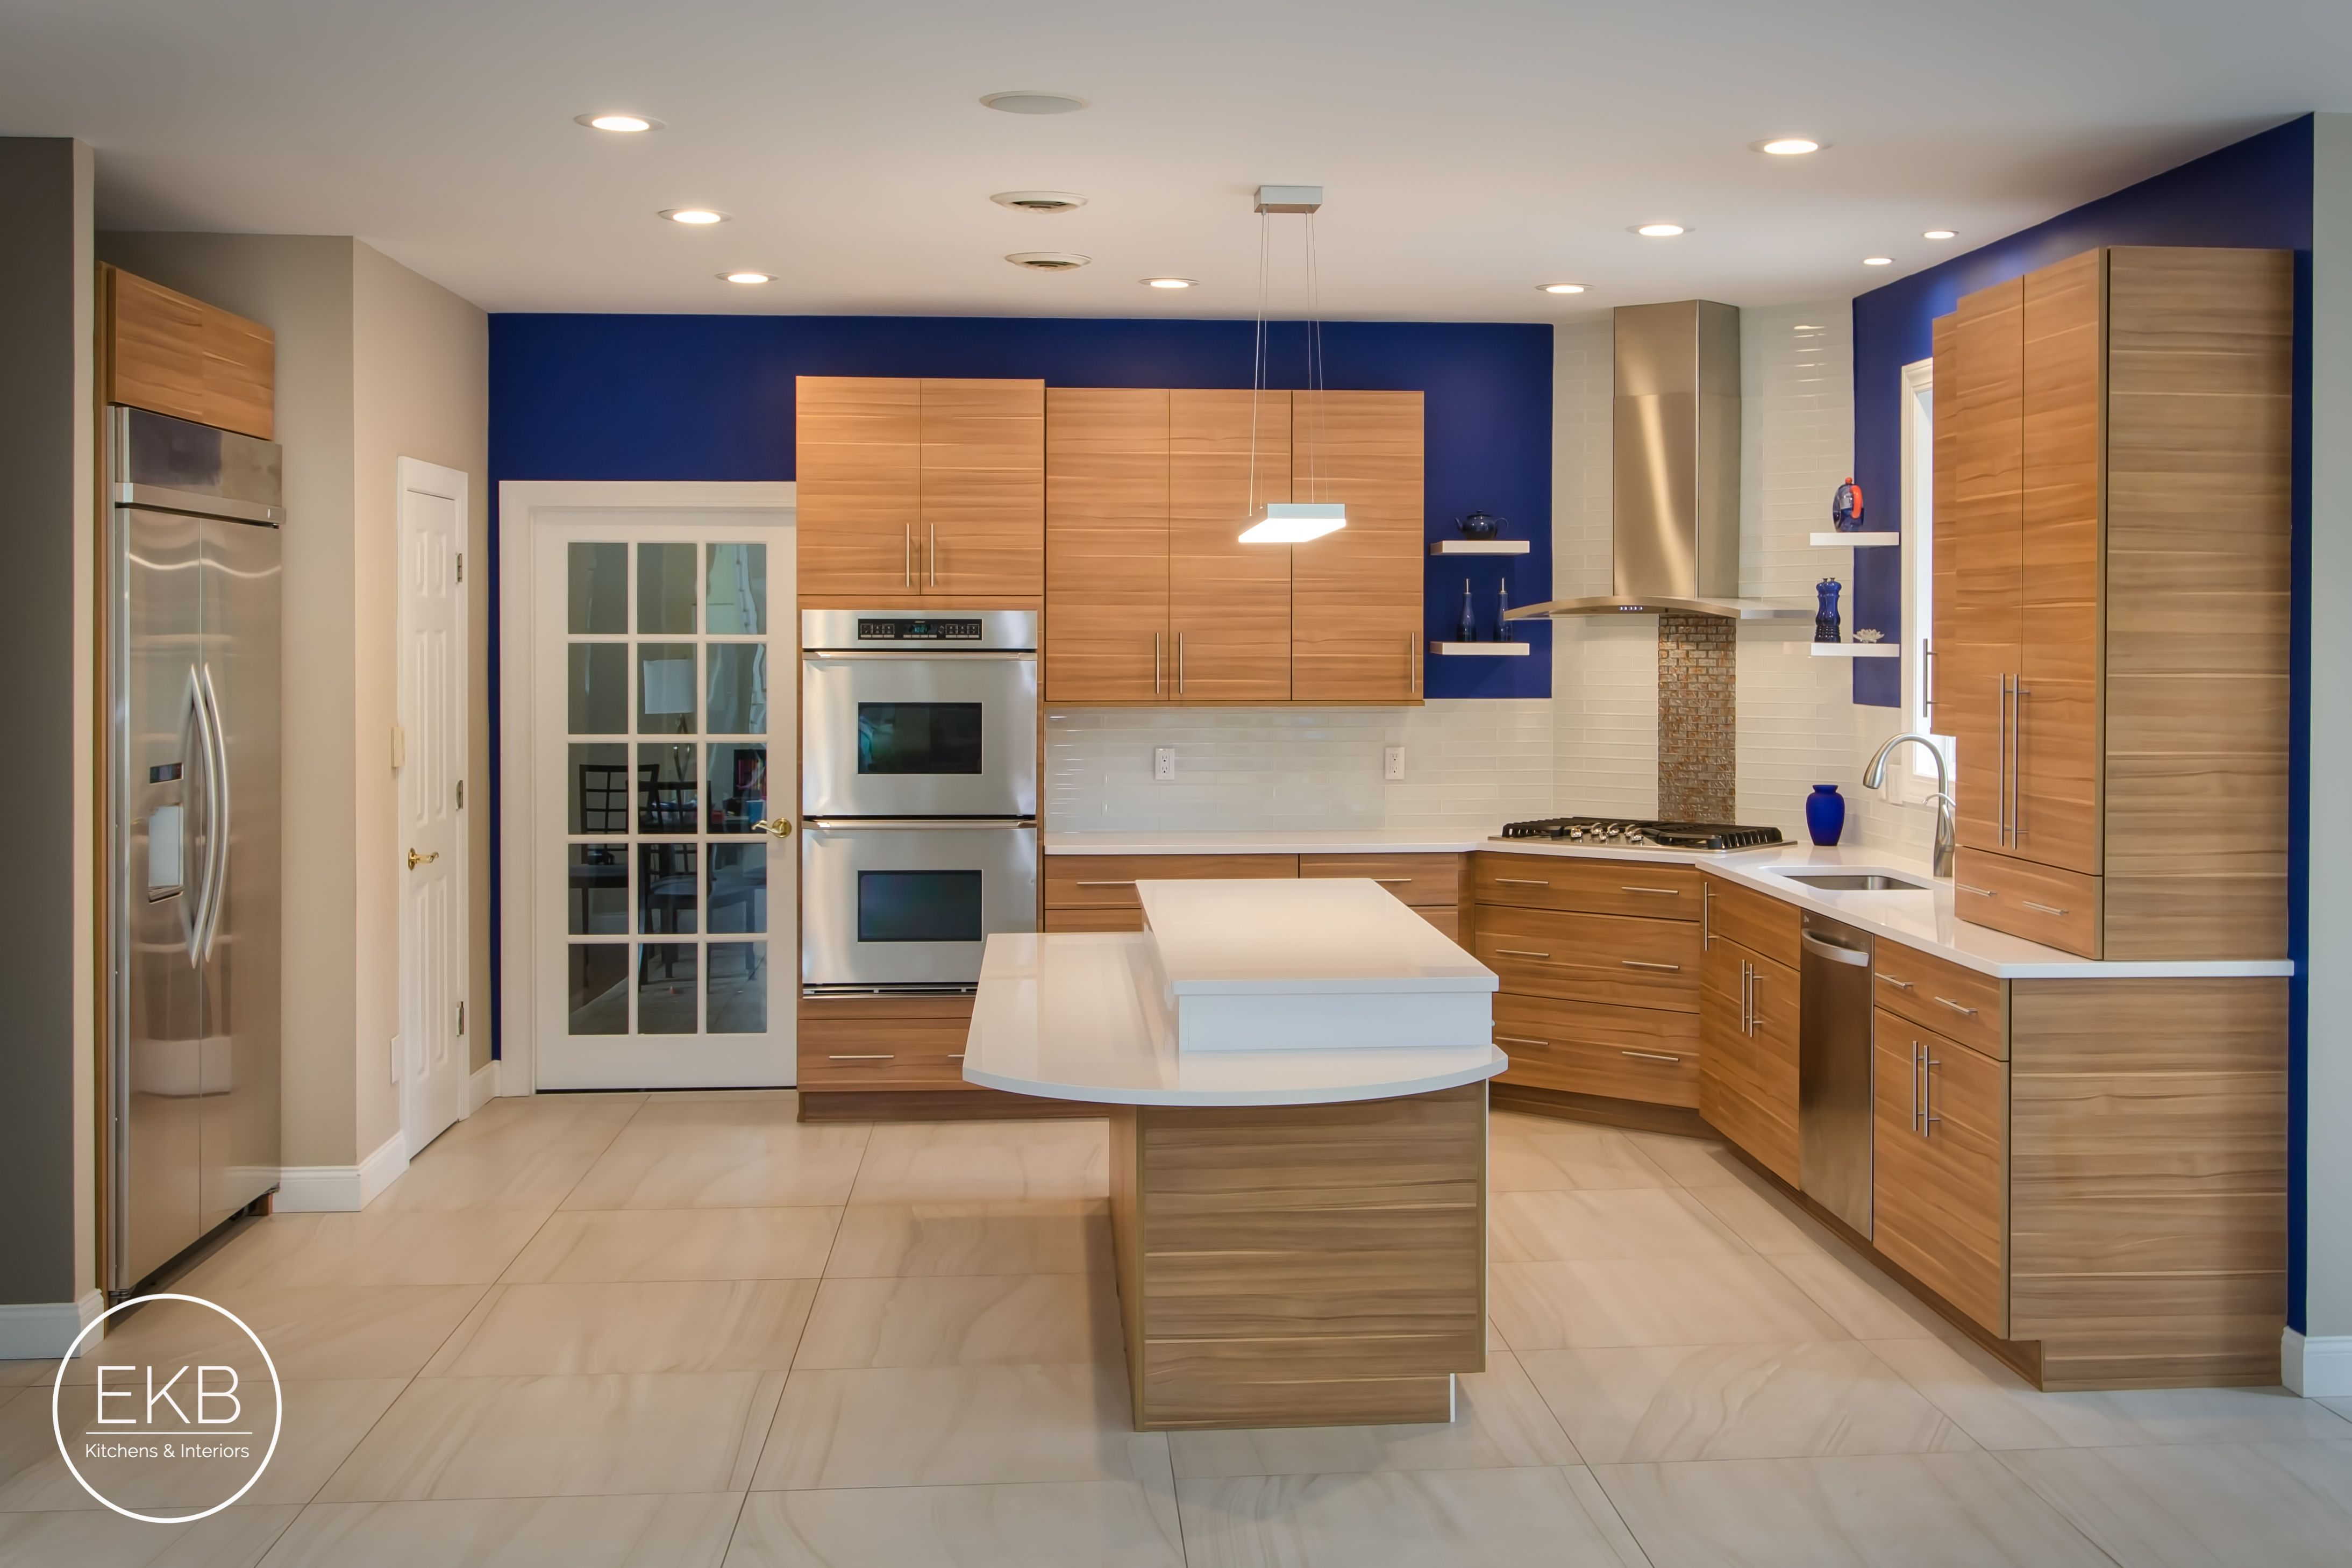 Shiloh Melamine Cabinets In Arizona Cypress And White Zues Silestone Countertops